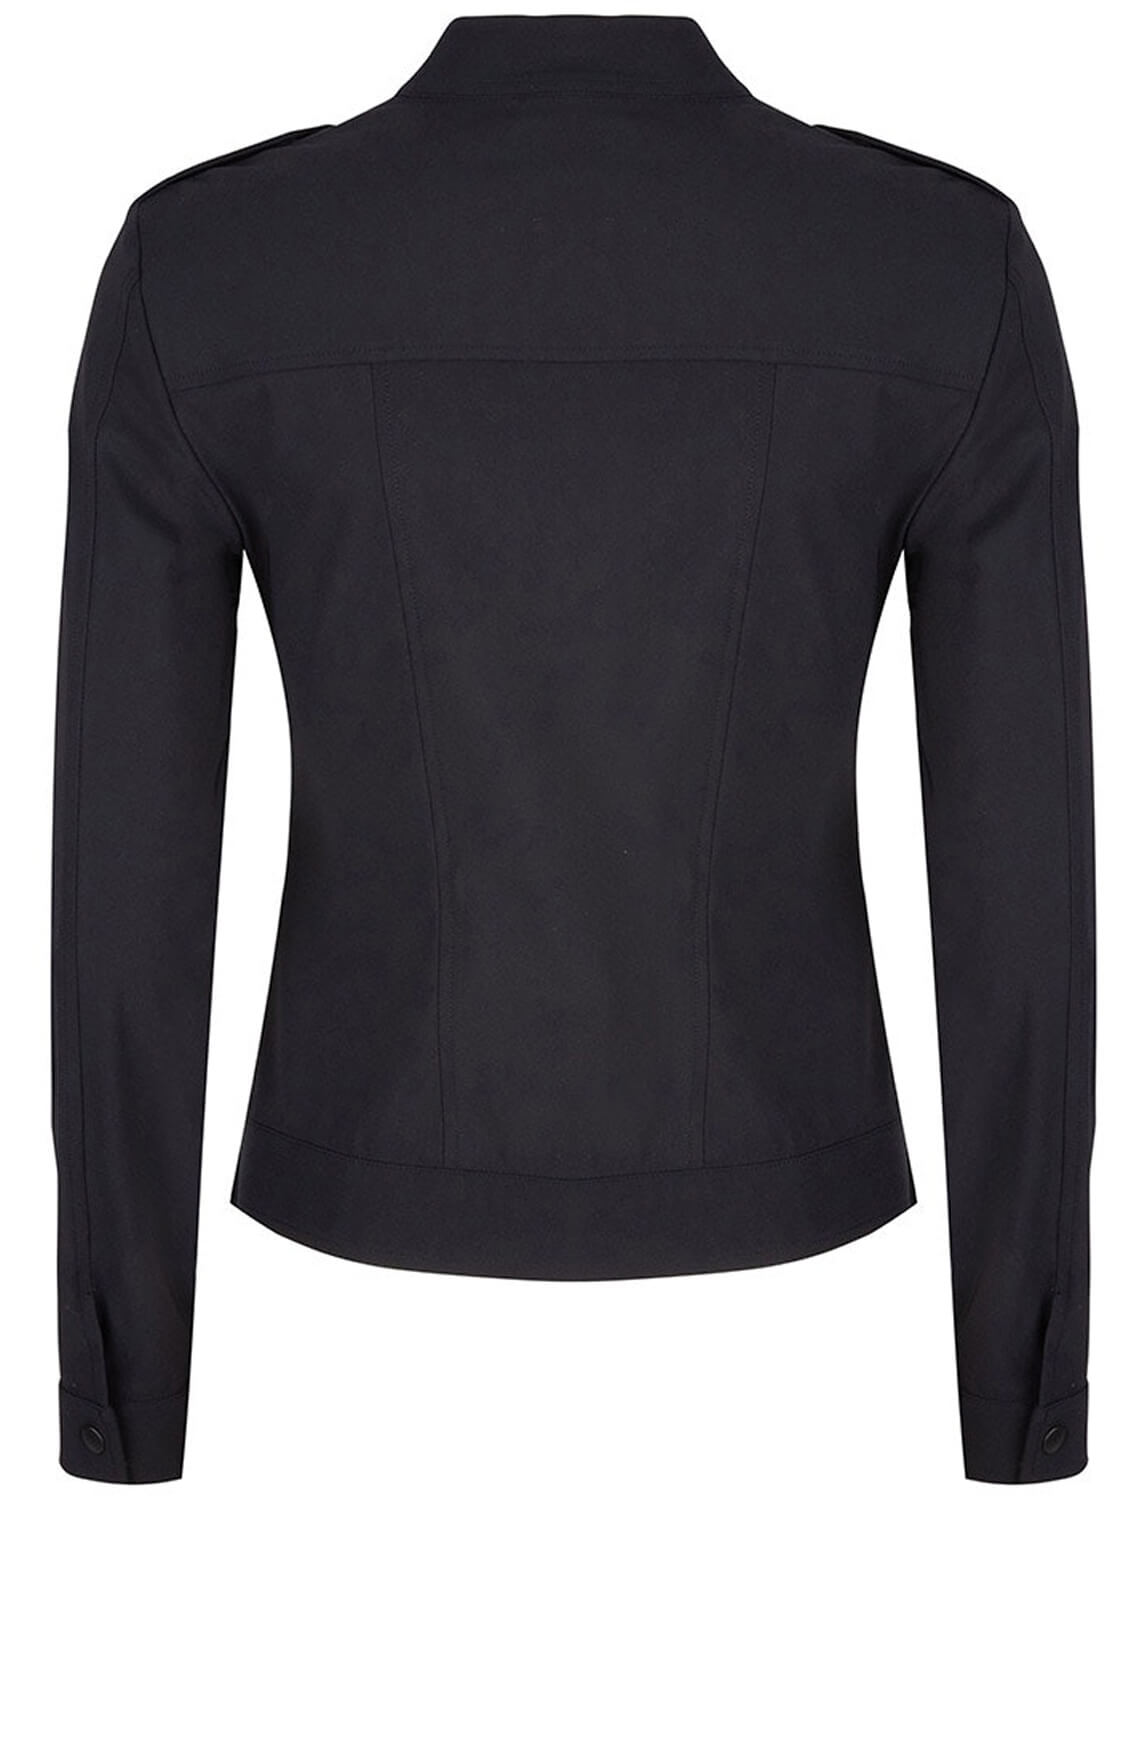 Jane Lushka Dames Military jersey blazer zwart